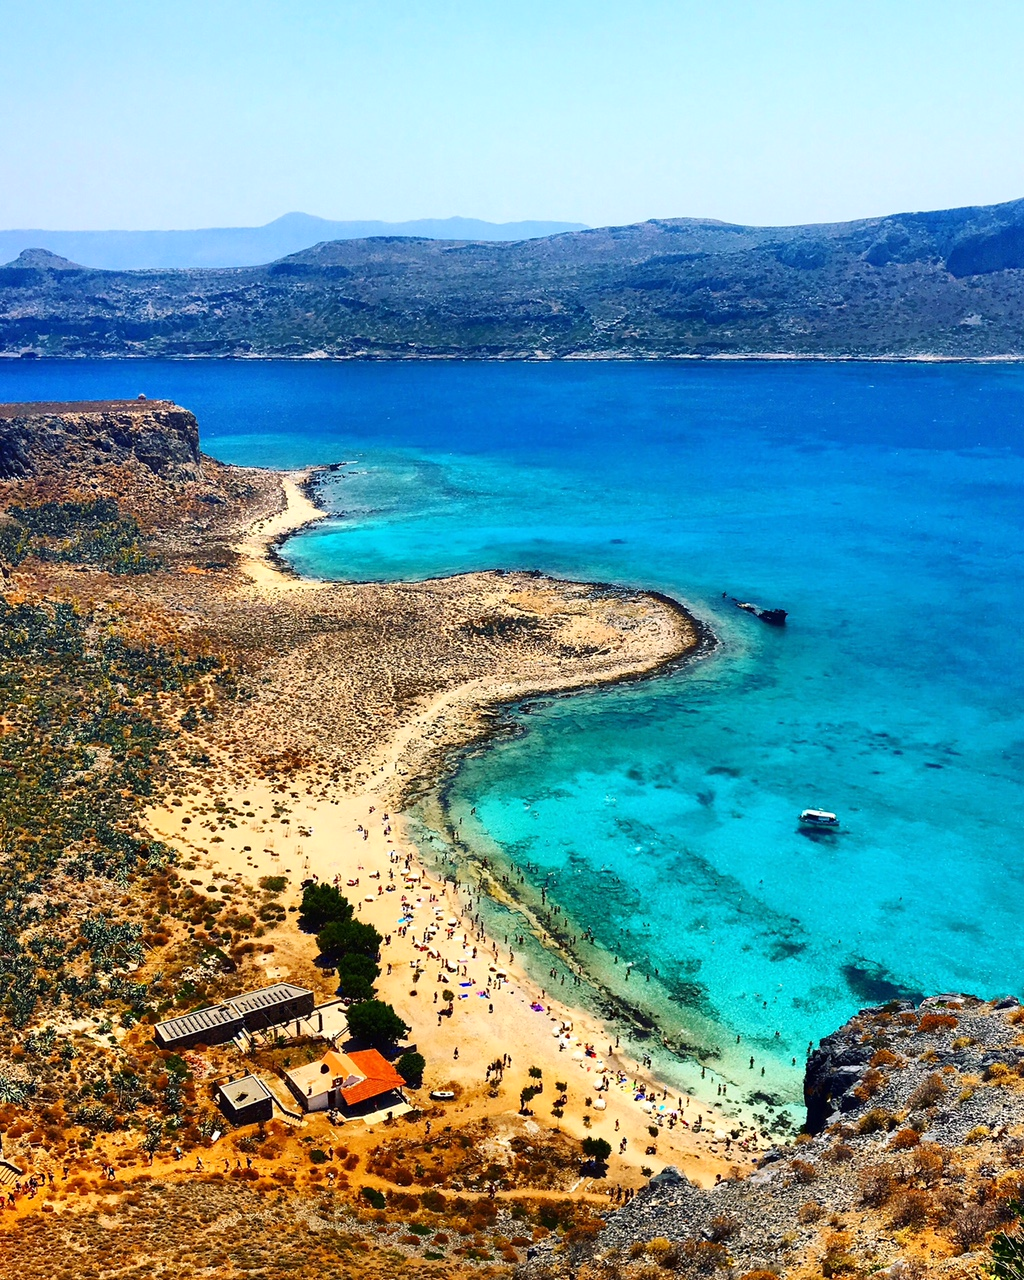 Imeri-Gramvousa2_Crete CRETE- THE BEST OF THE CHANIA REGION